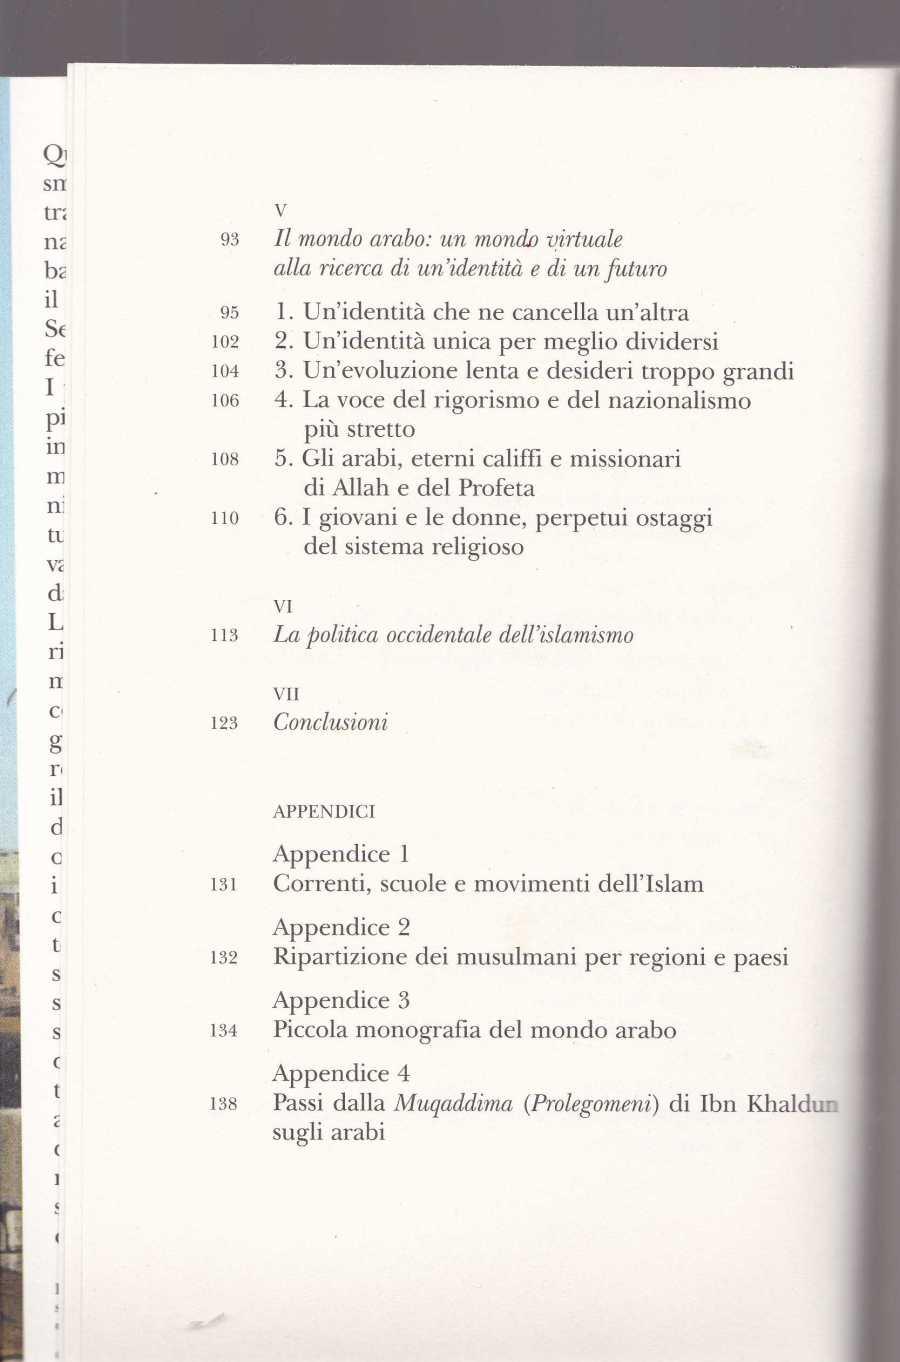 SANSAL BOUALEM2630